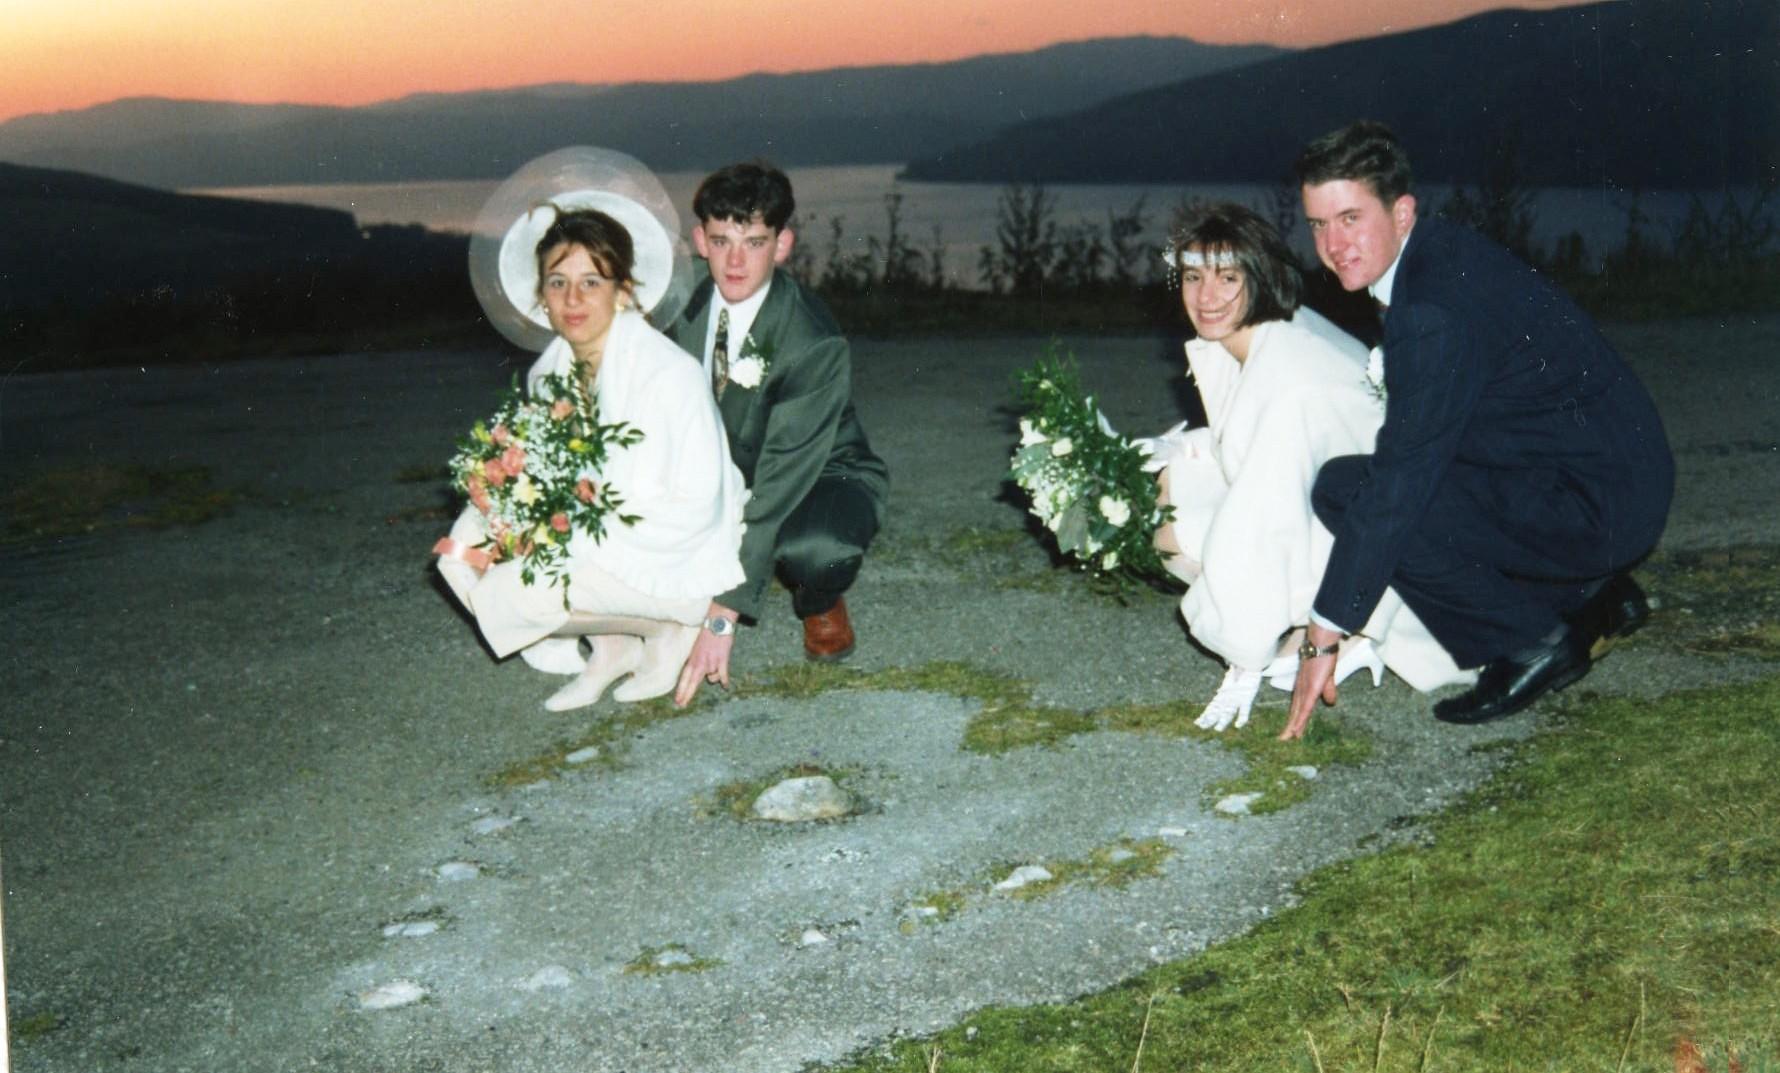 Stuart MacPhail & Alda Viali & Craig MacPhail & Tanja Tedeschi's Wedding